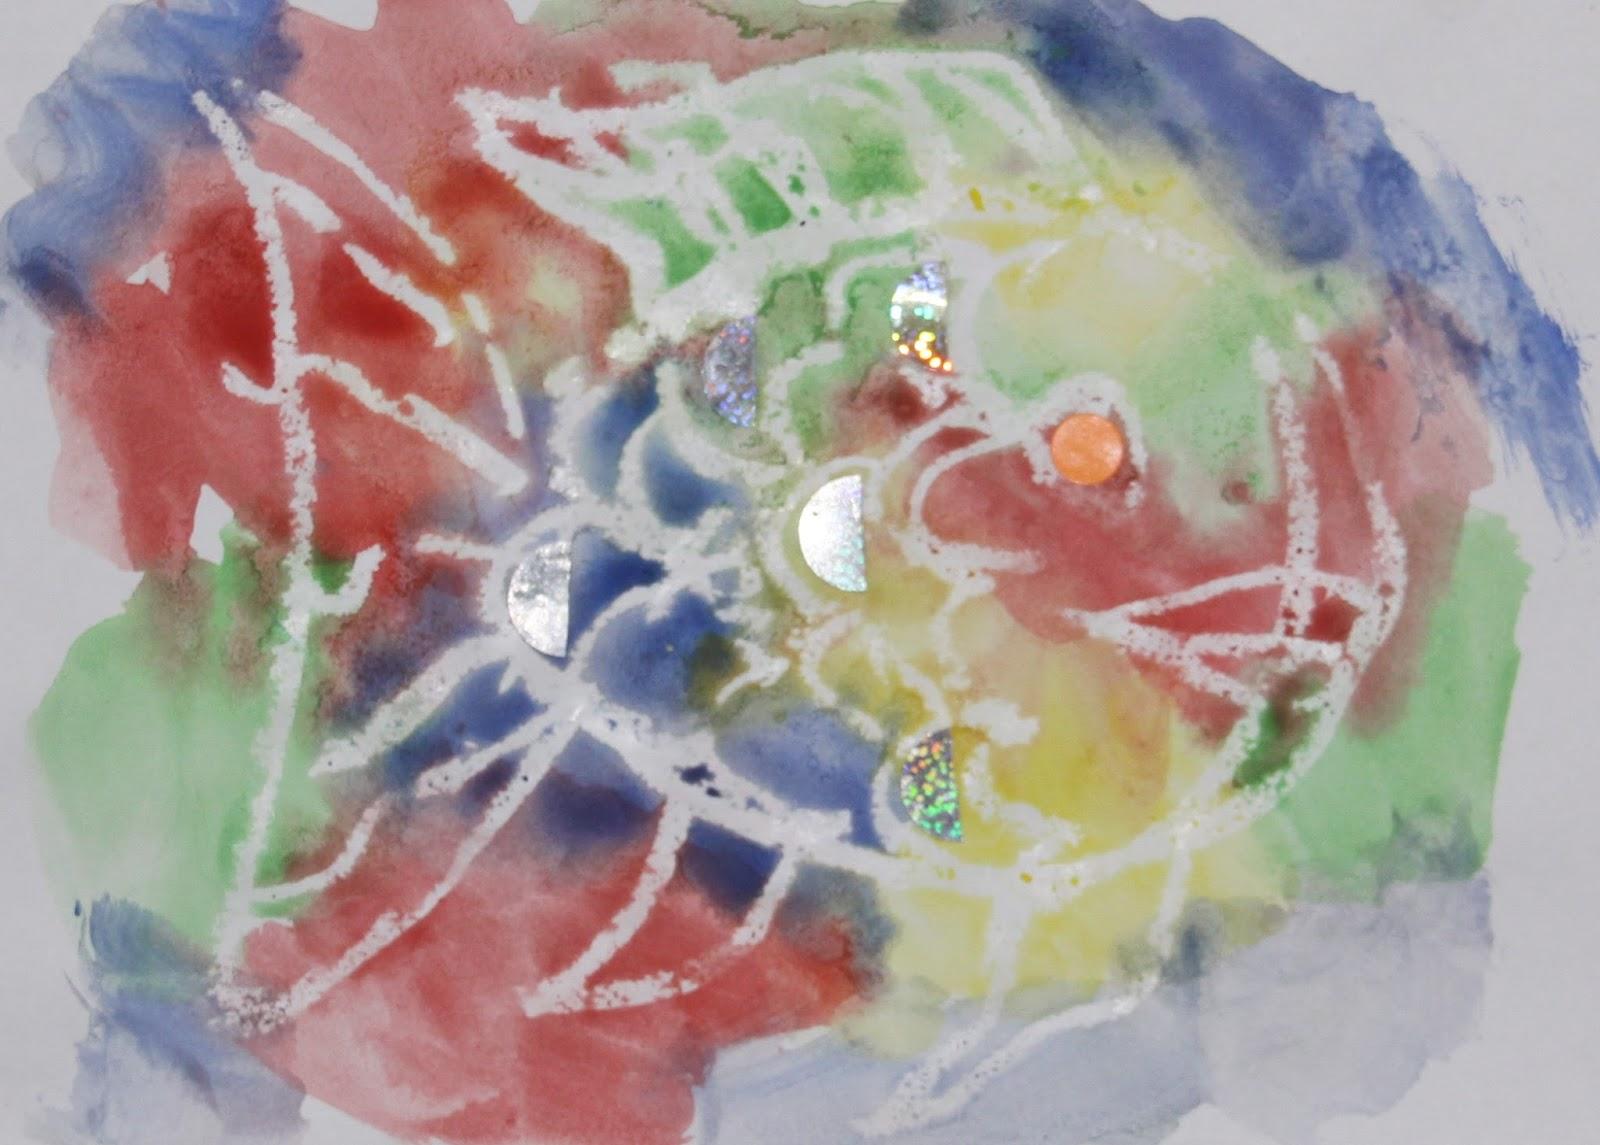 Arty Crafty Studio The Rainbow Fish Resist Painting